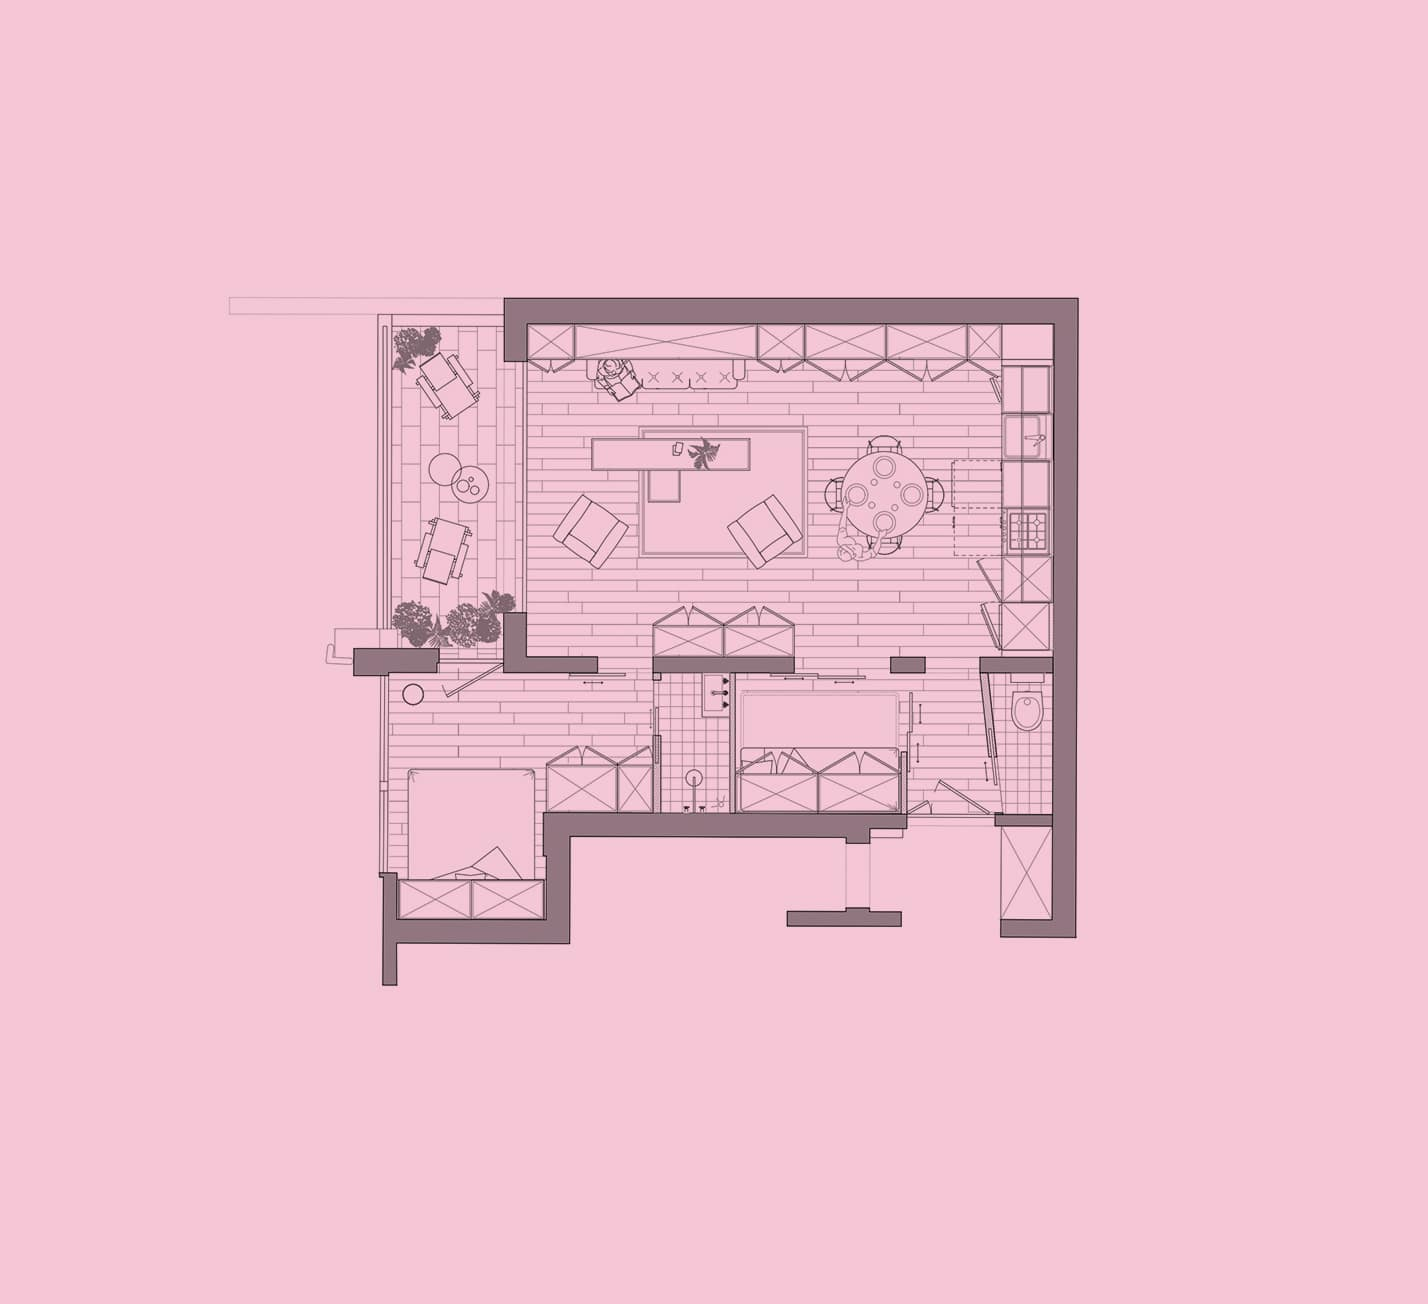 Projet-Albert-Atelier-Steve-Pauline-Borgia-Architecte-Plan-01-min-1